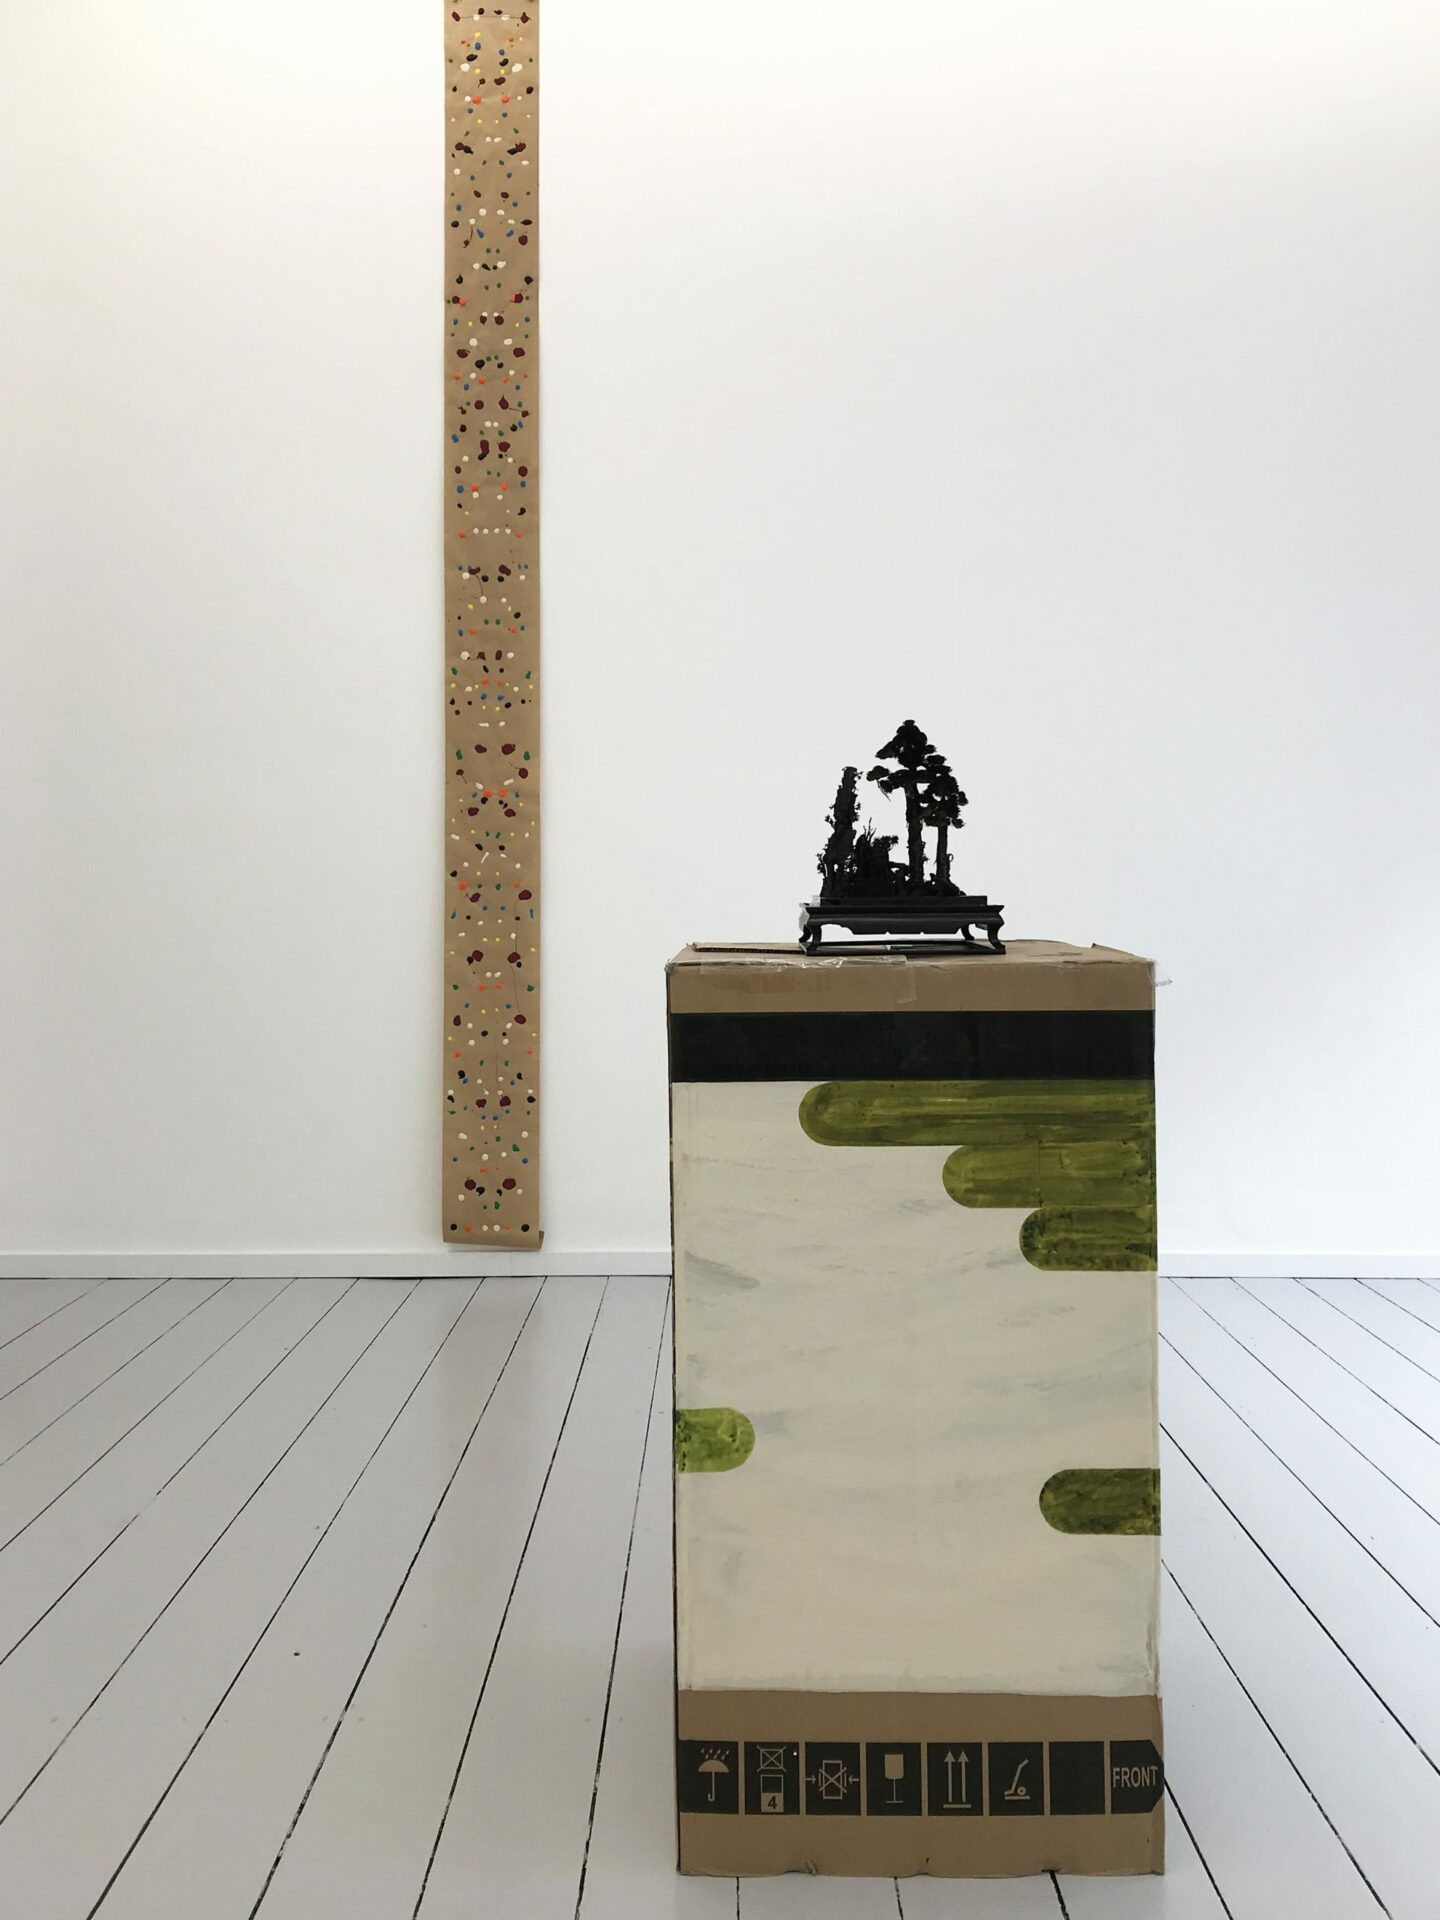 THE | Diorama on cardboard | Rohrschach game 1 | 2019